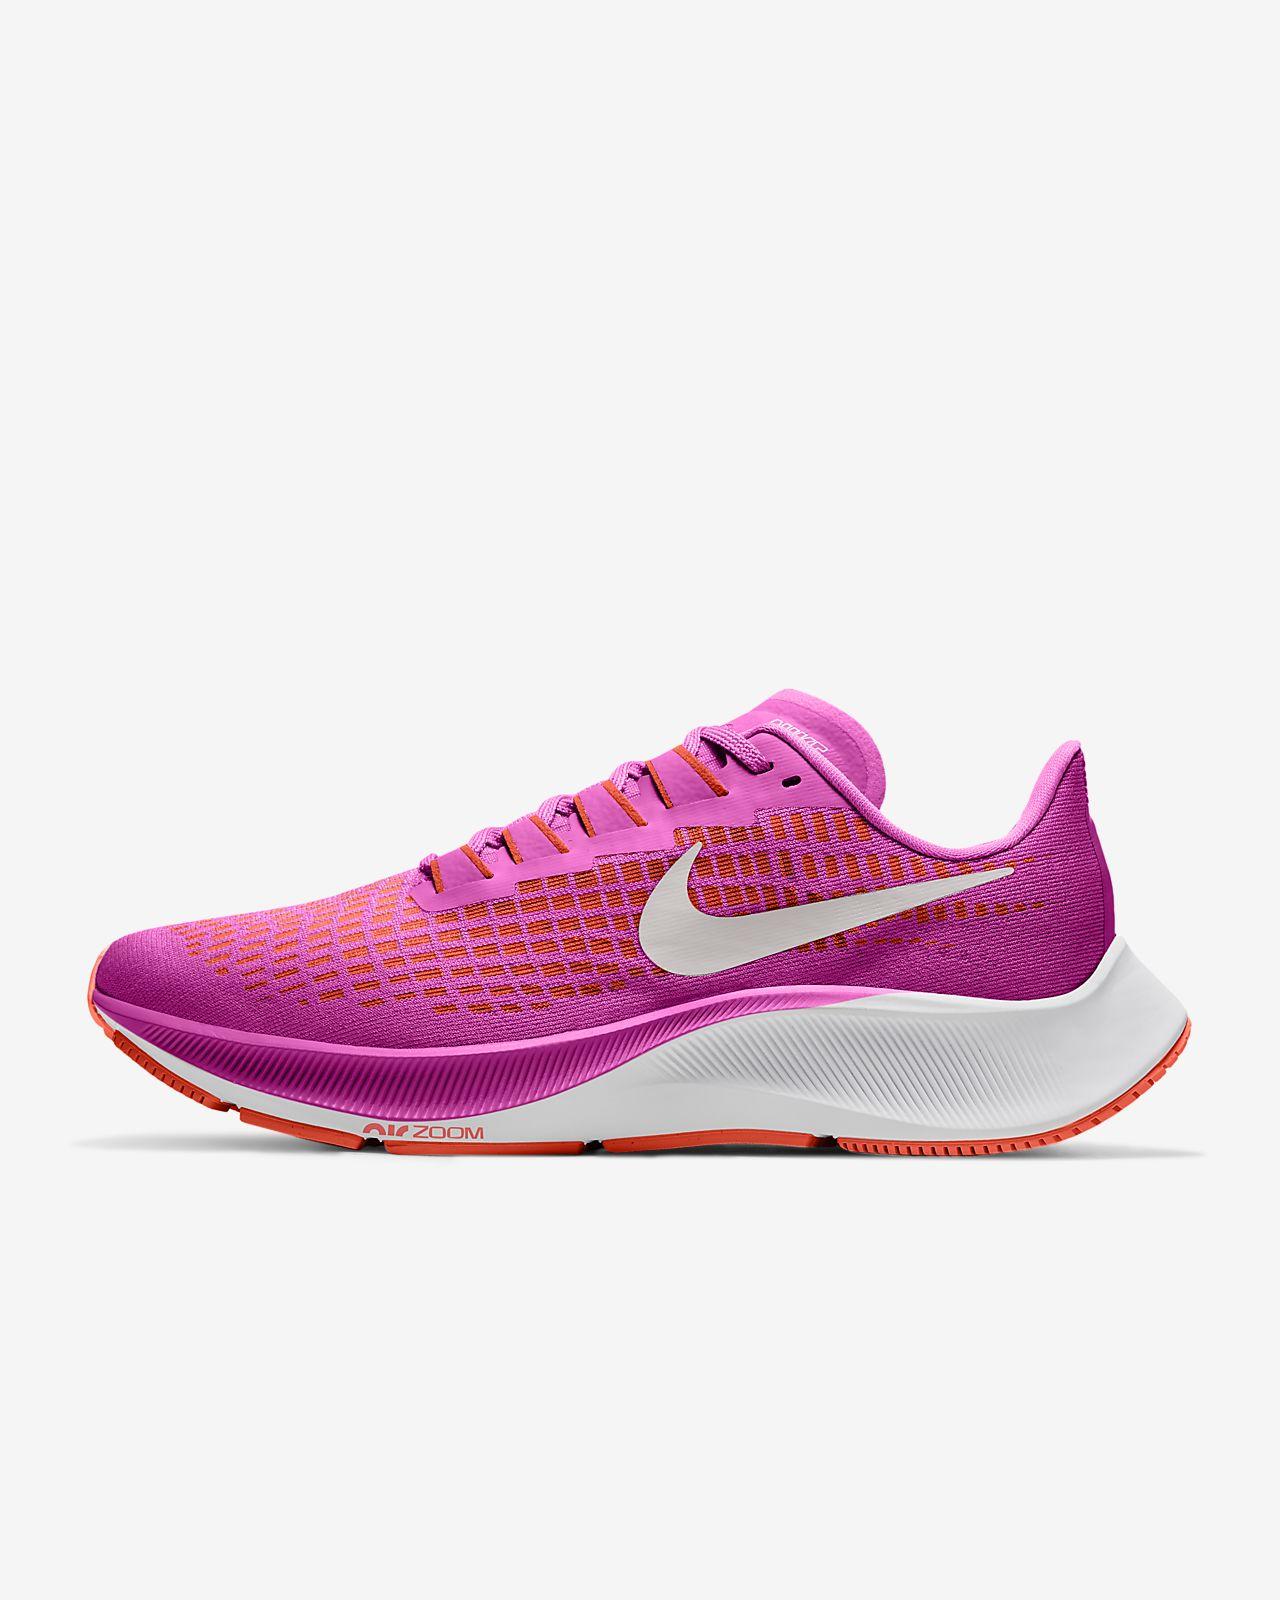 Scarpa da running Nike Air Zoom Pegasus 37 - Donna